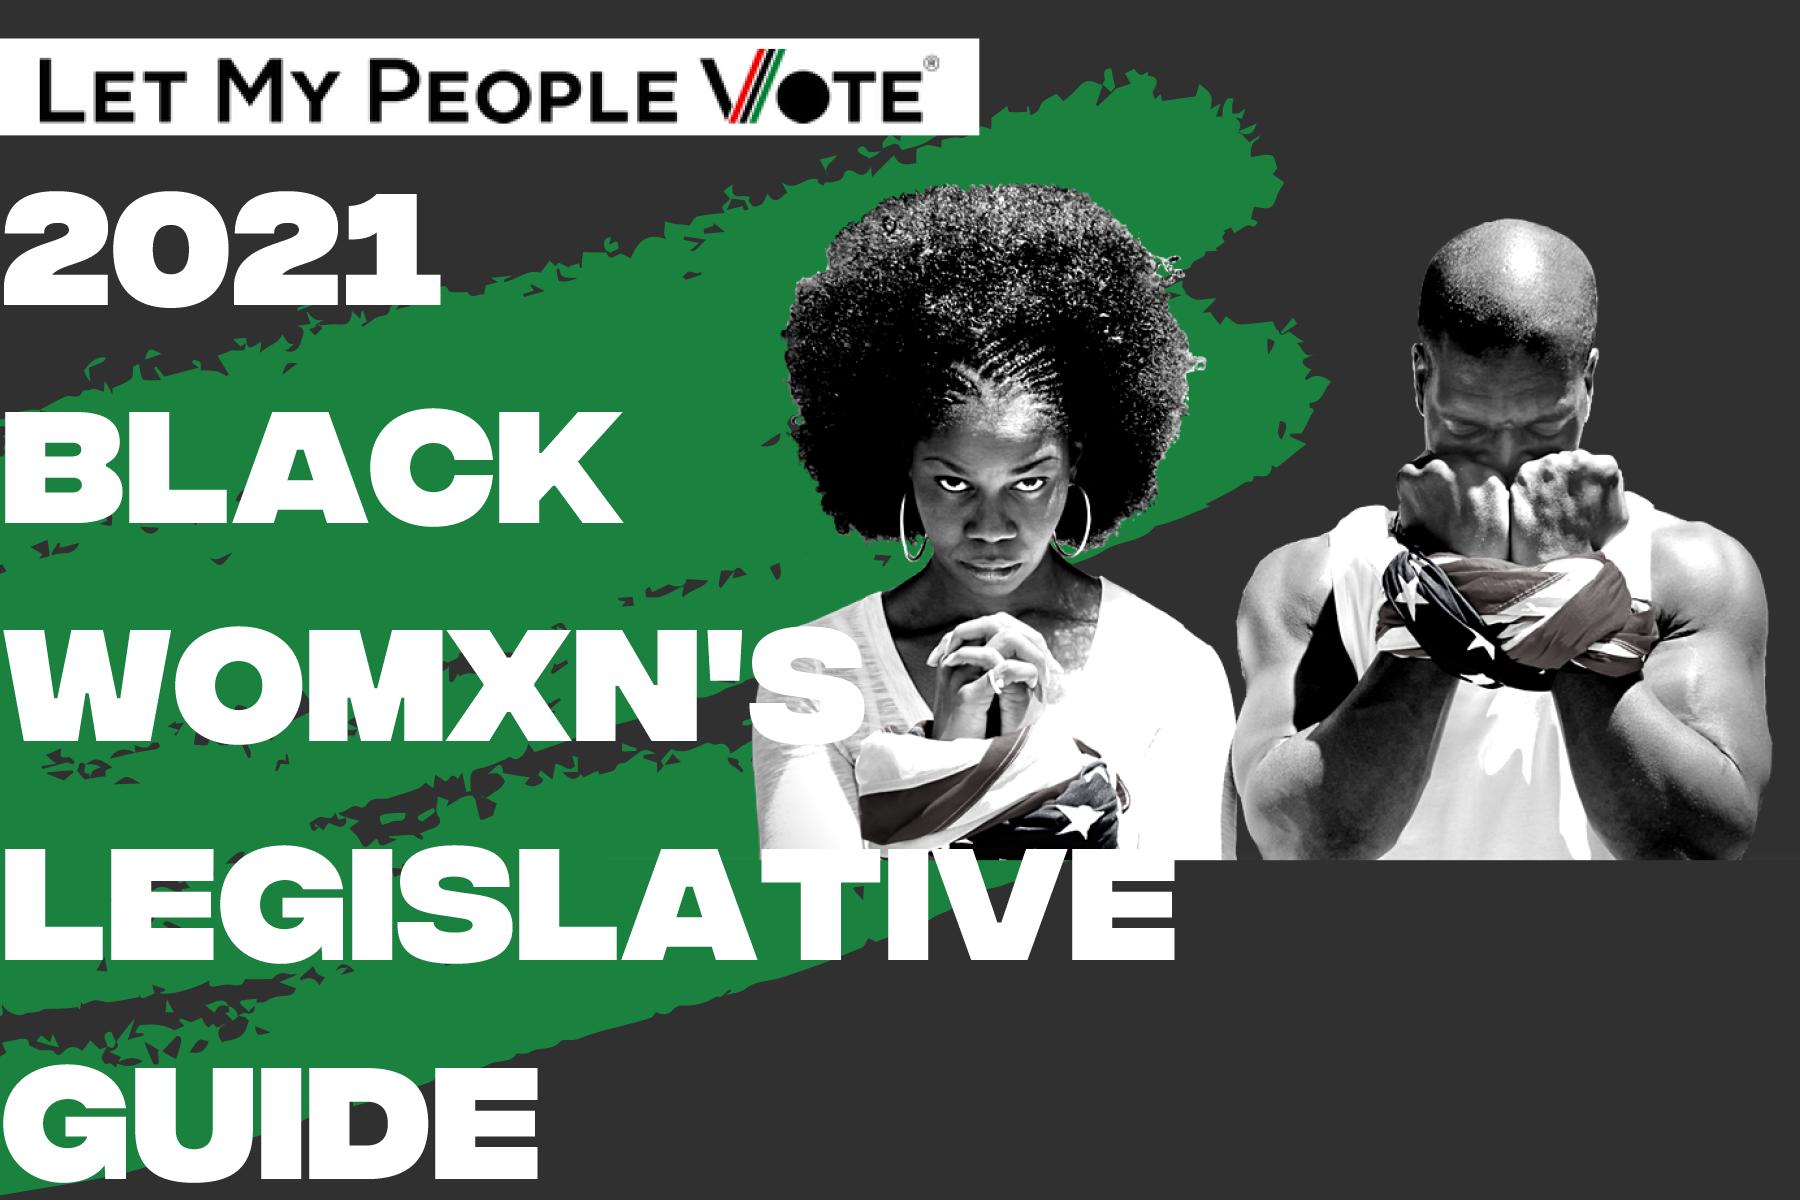 Soul 2 Soul Sisters 2021 Black Womxn's Legislative Guide